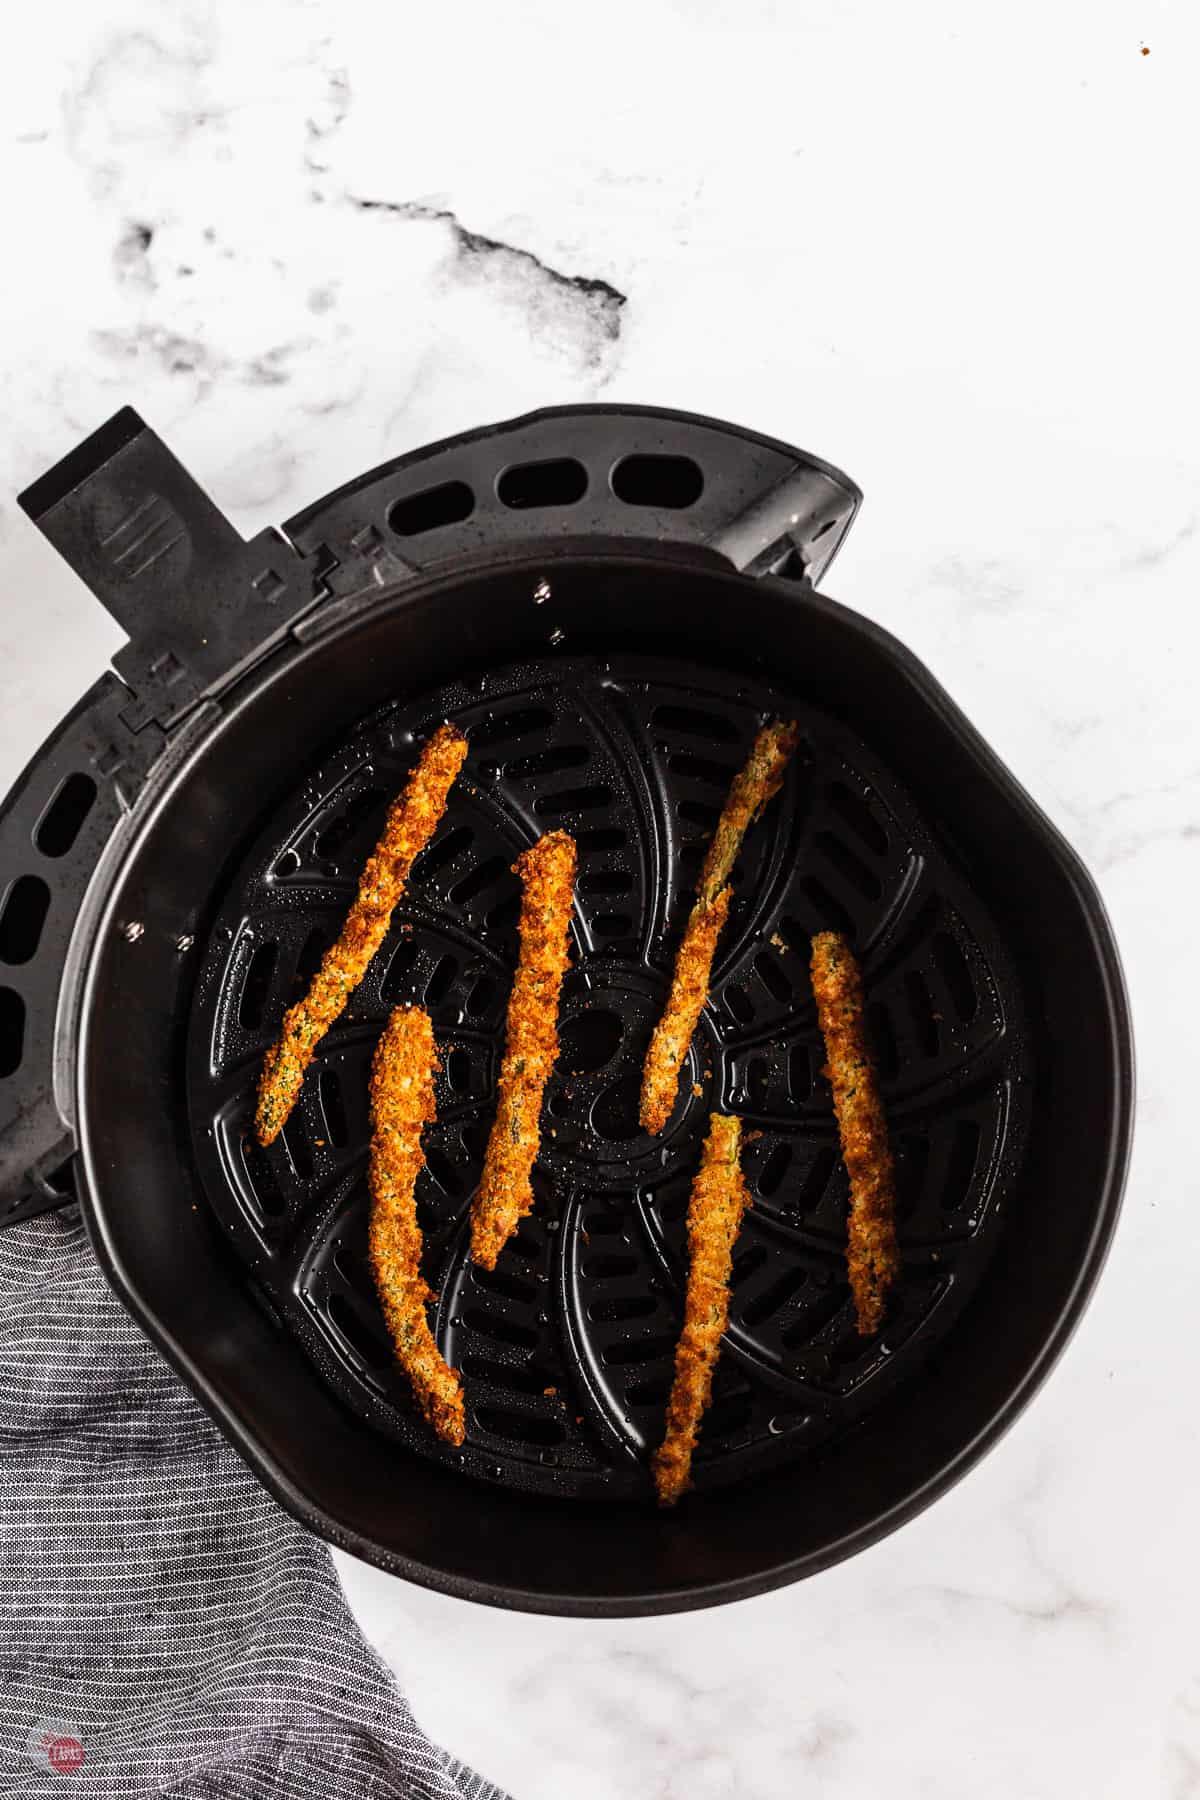 crispy asparagus in an air fryer basket